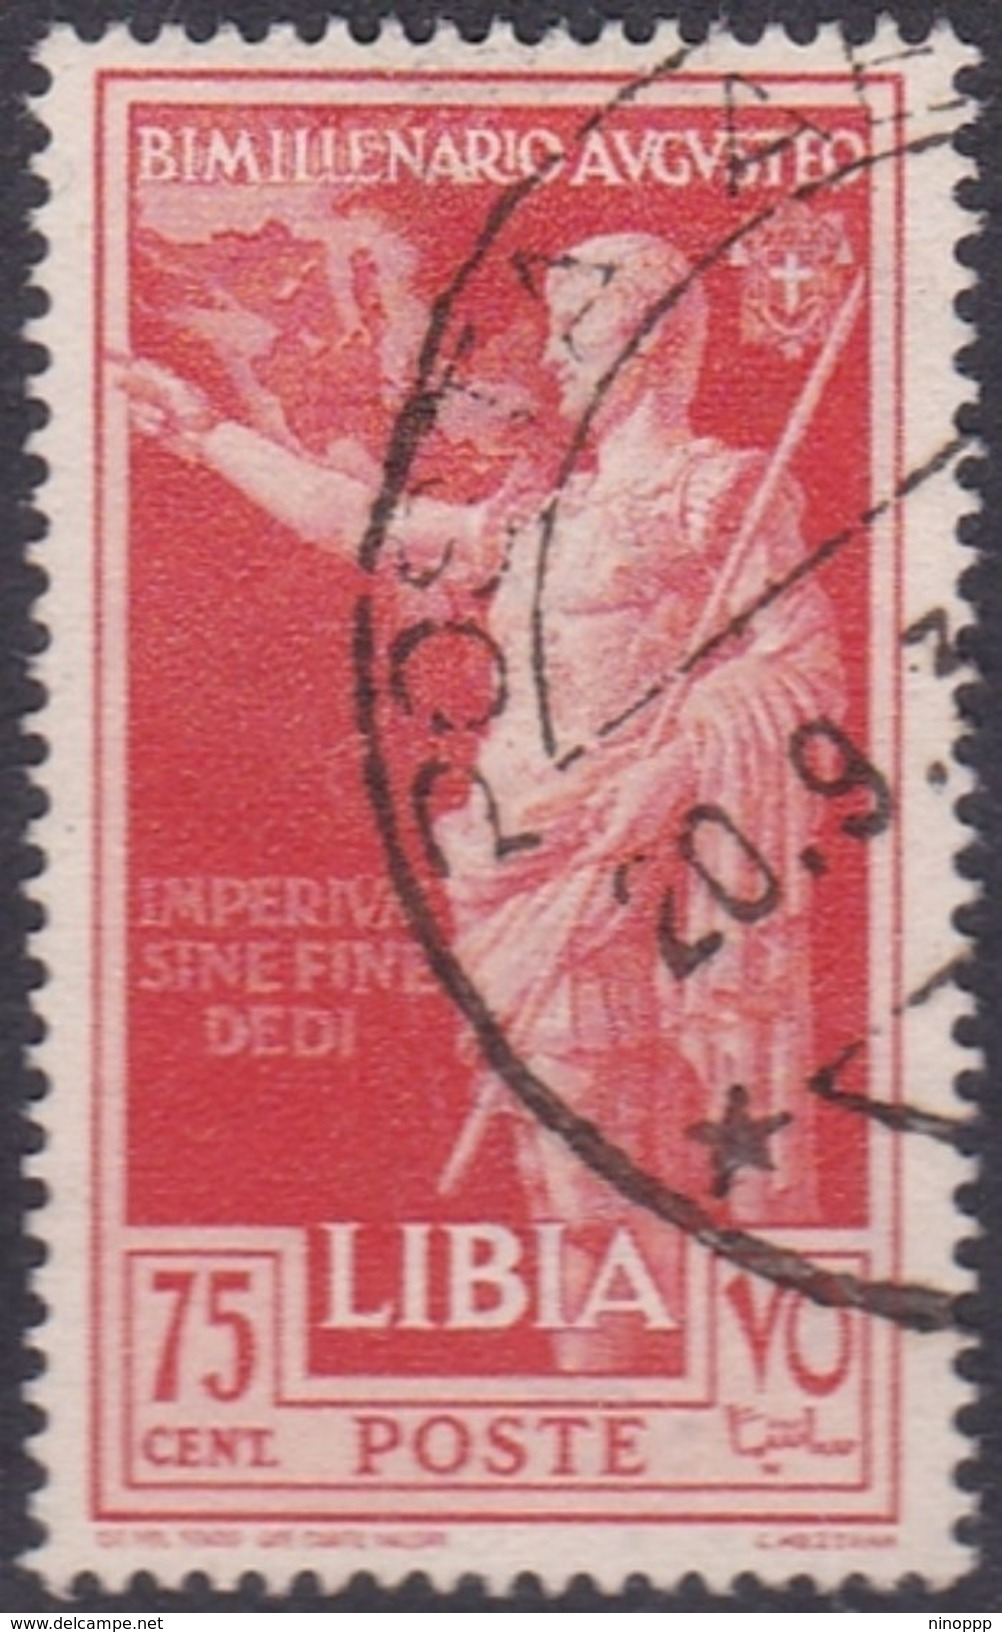 Italy-Colonies And Territories-Libya S 156 1938 Augustus Birth Bimillenary,75c Red,used - Libya